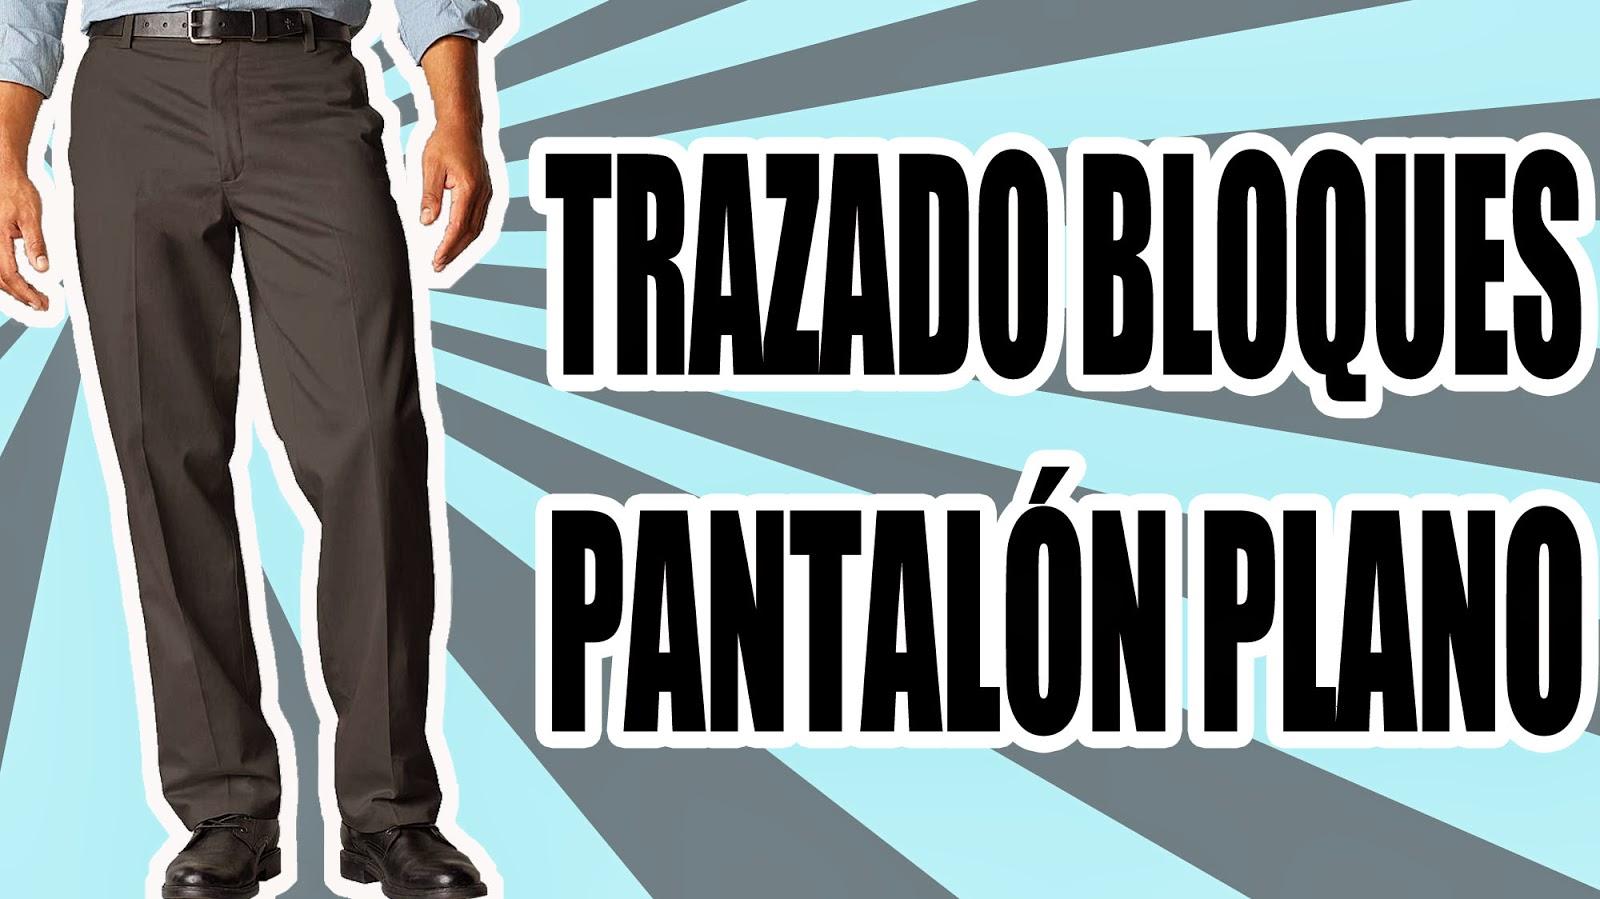 imagenes de pantalones para hombre - imagenes de pantalones | Pantalones de hombre Moda Hombre